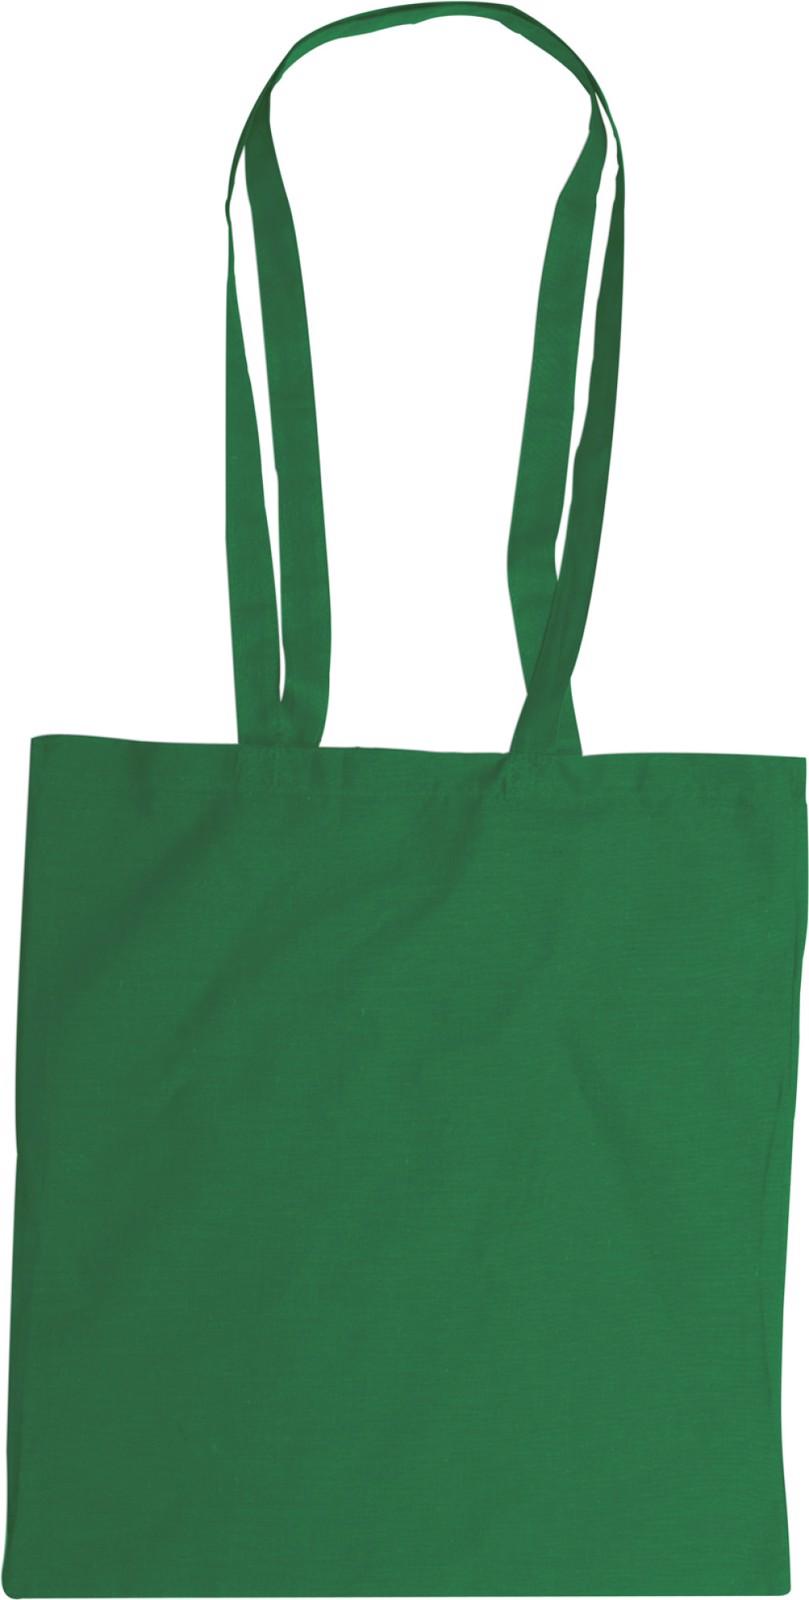 Cotton (110 gr/m²) bag - Green